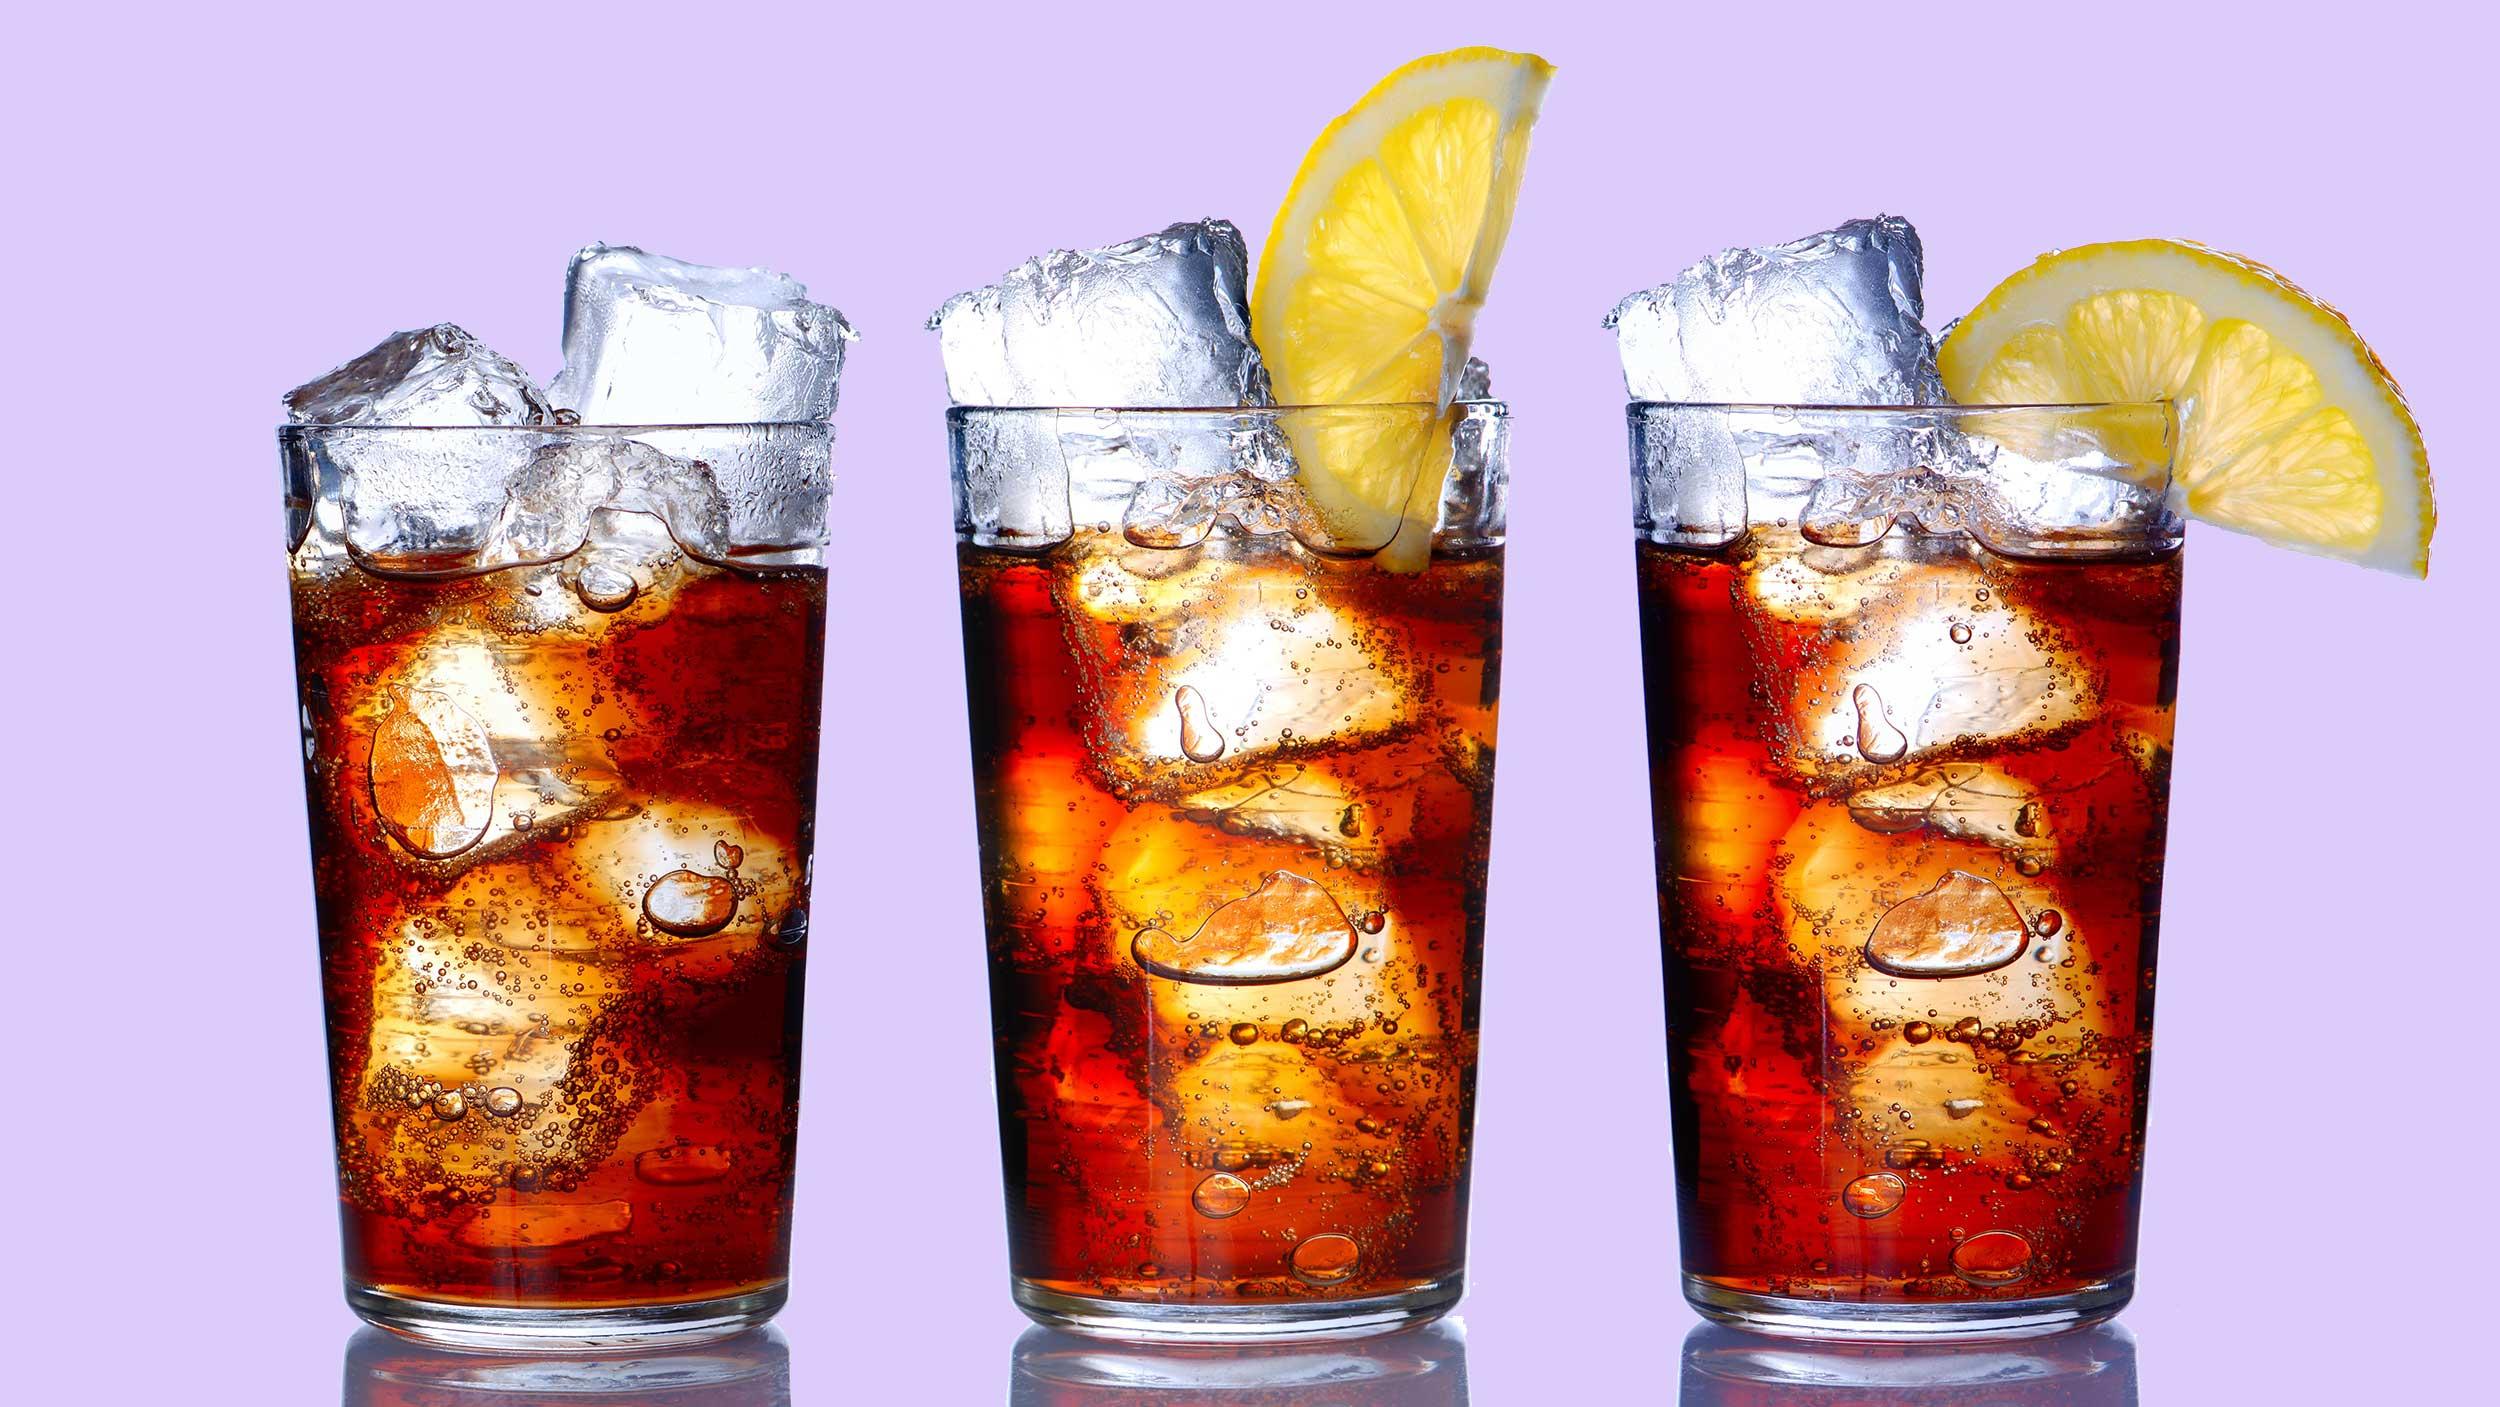 Refrigerantes diet engordam?